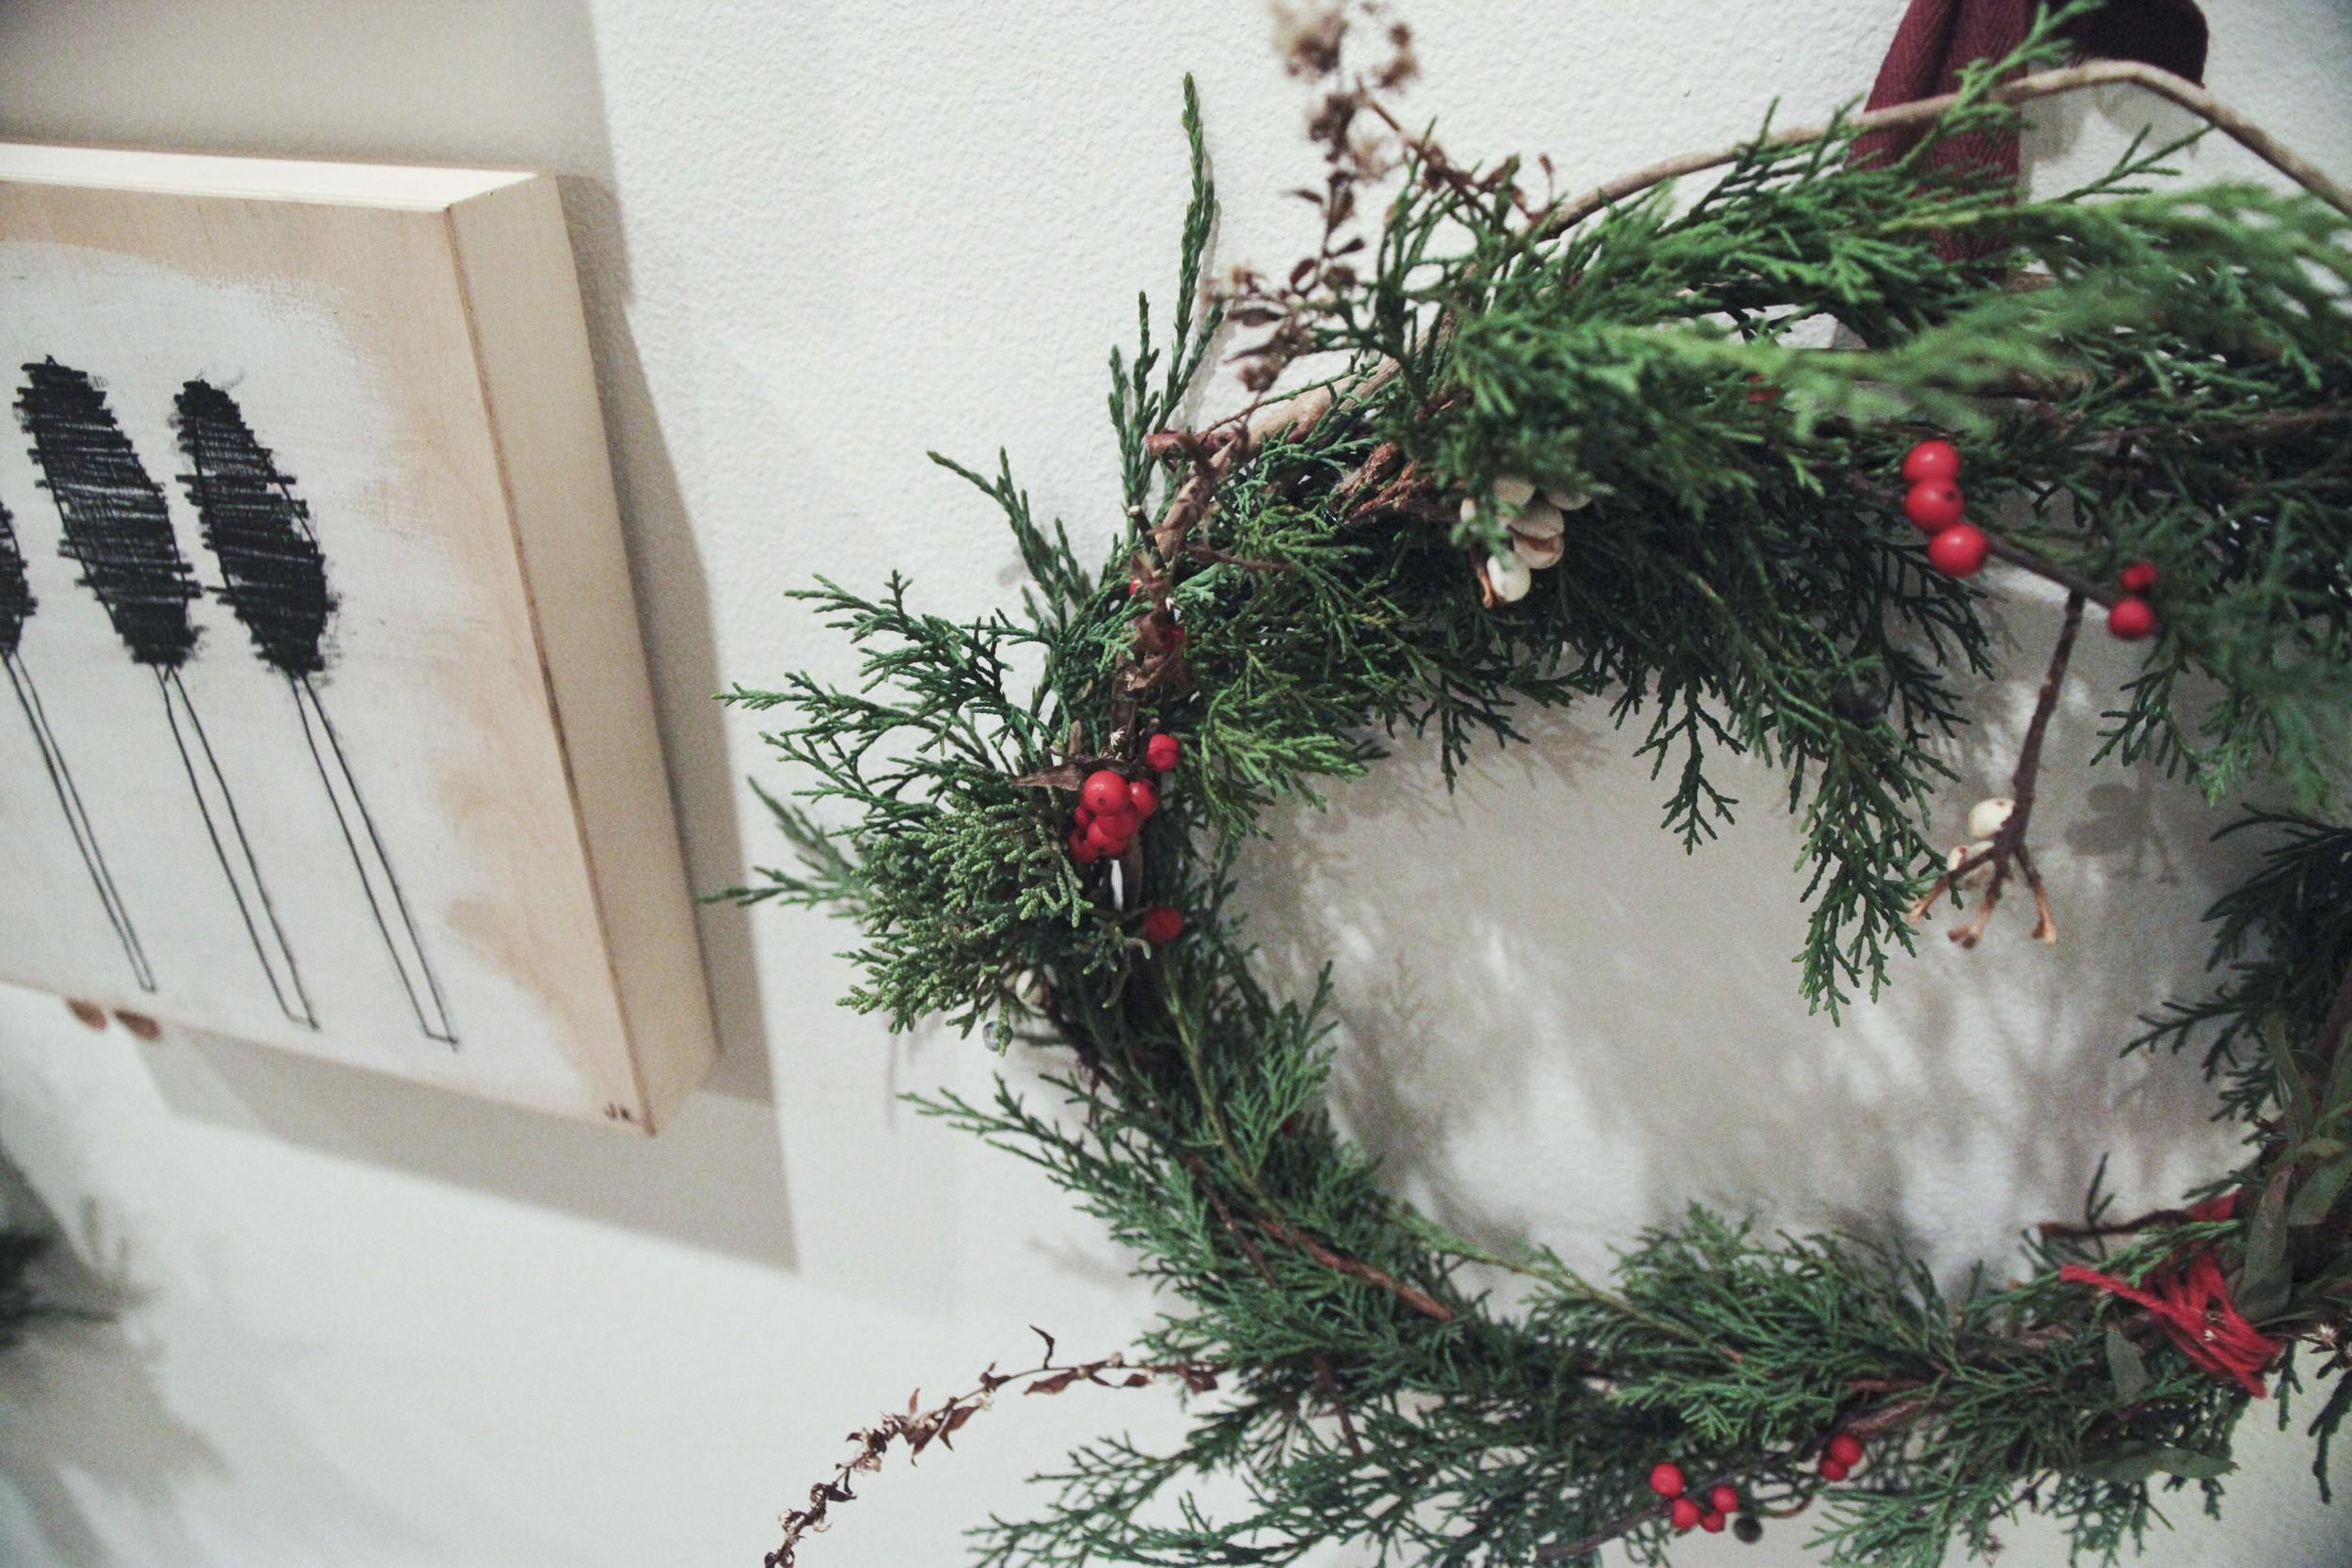 o-workshop-2014-wreath-details_23.jpg